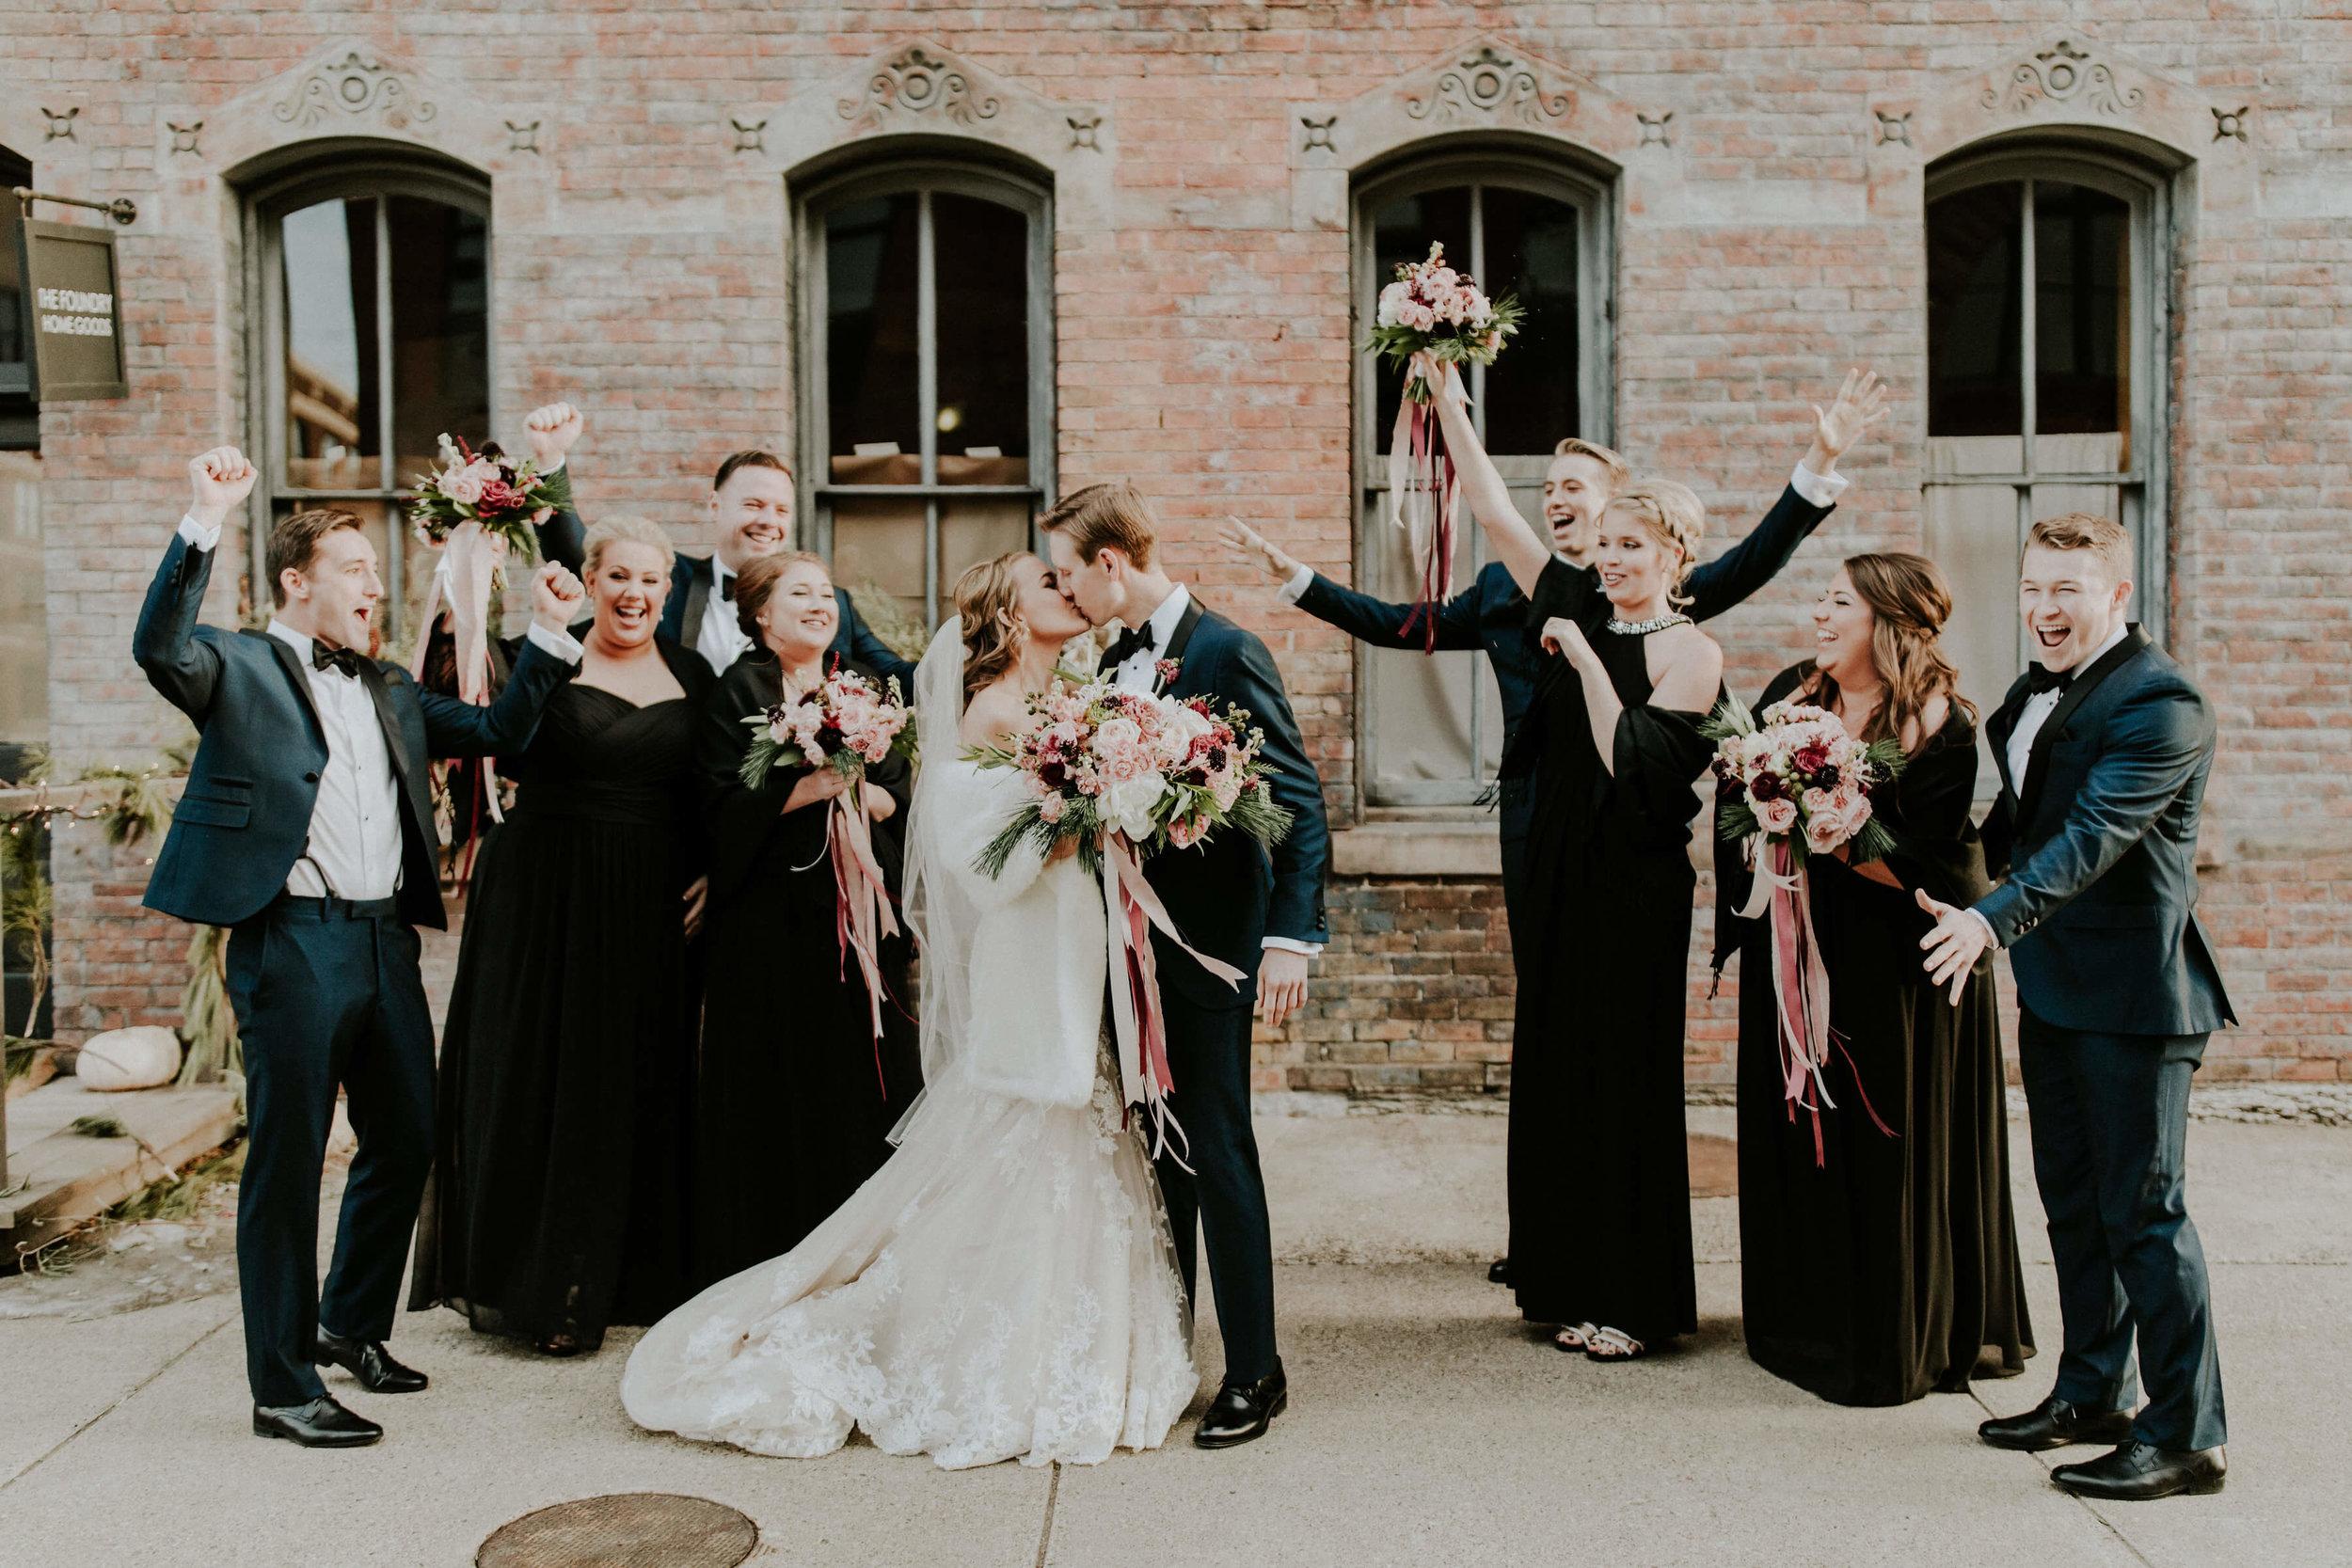 Kim+Greg_Jordan_Wedding_Aria_Russell_Heeter_Photography-238.jpg